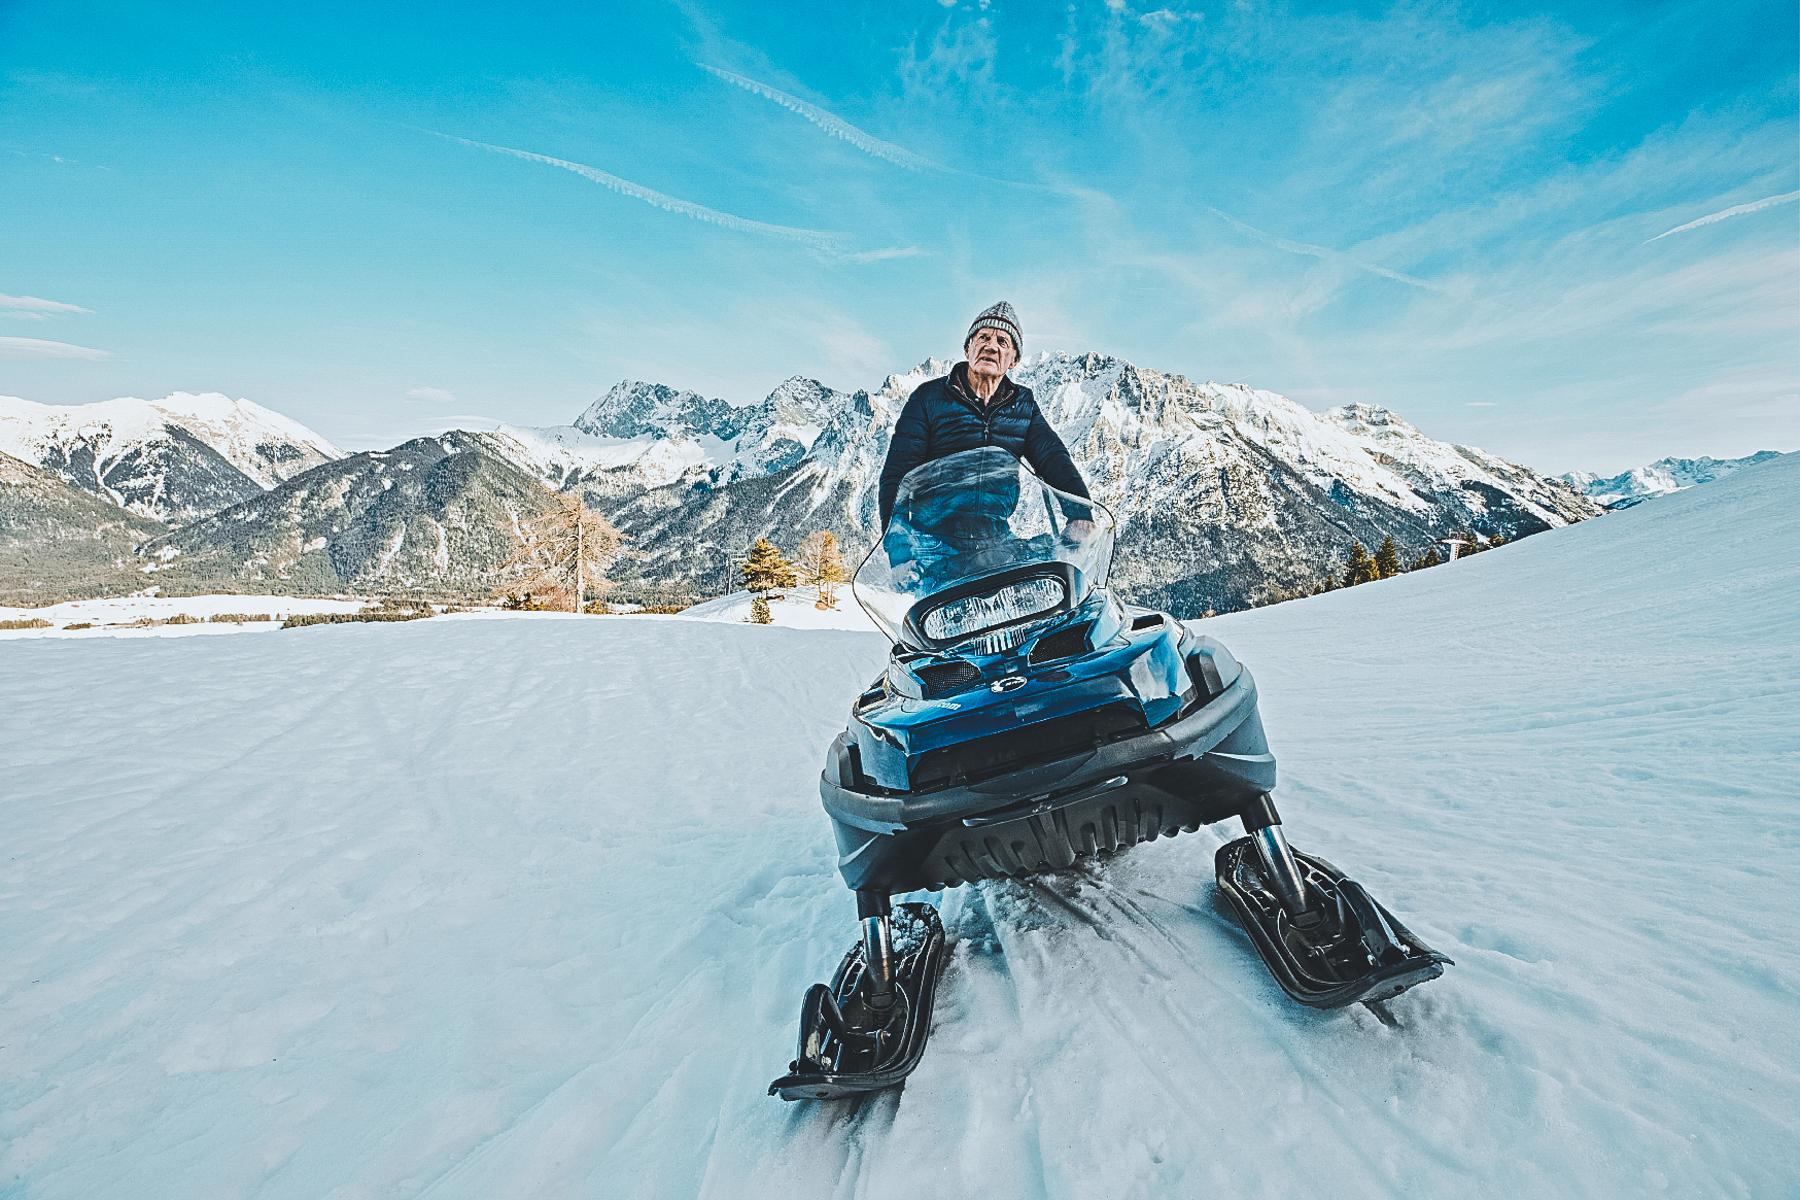 Wir fahren lieber zum Spaß mit dem flotten Schneemobil –nicht weil uns jemand am Berg einsammeln muss.  – ©Gert Krautbauer